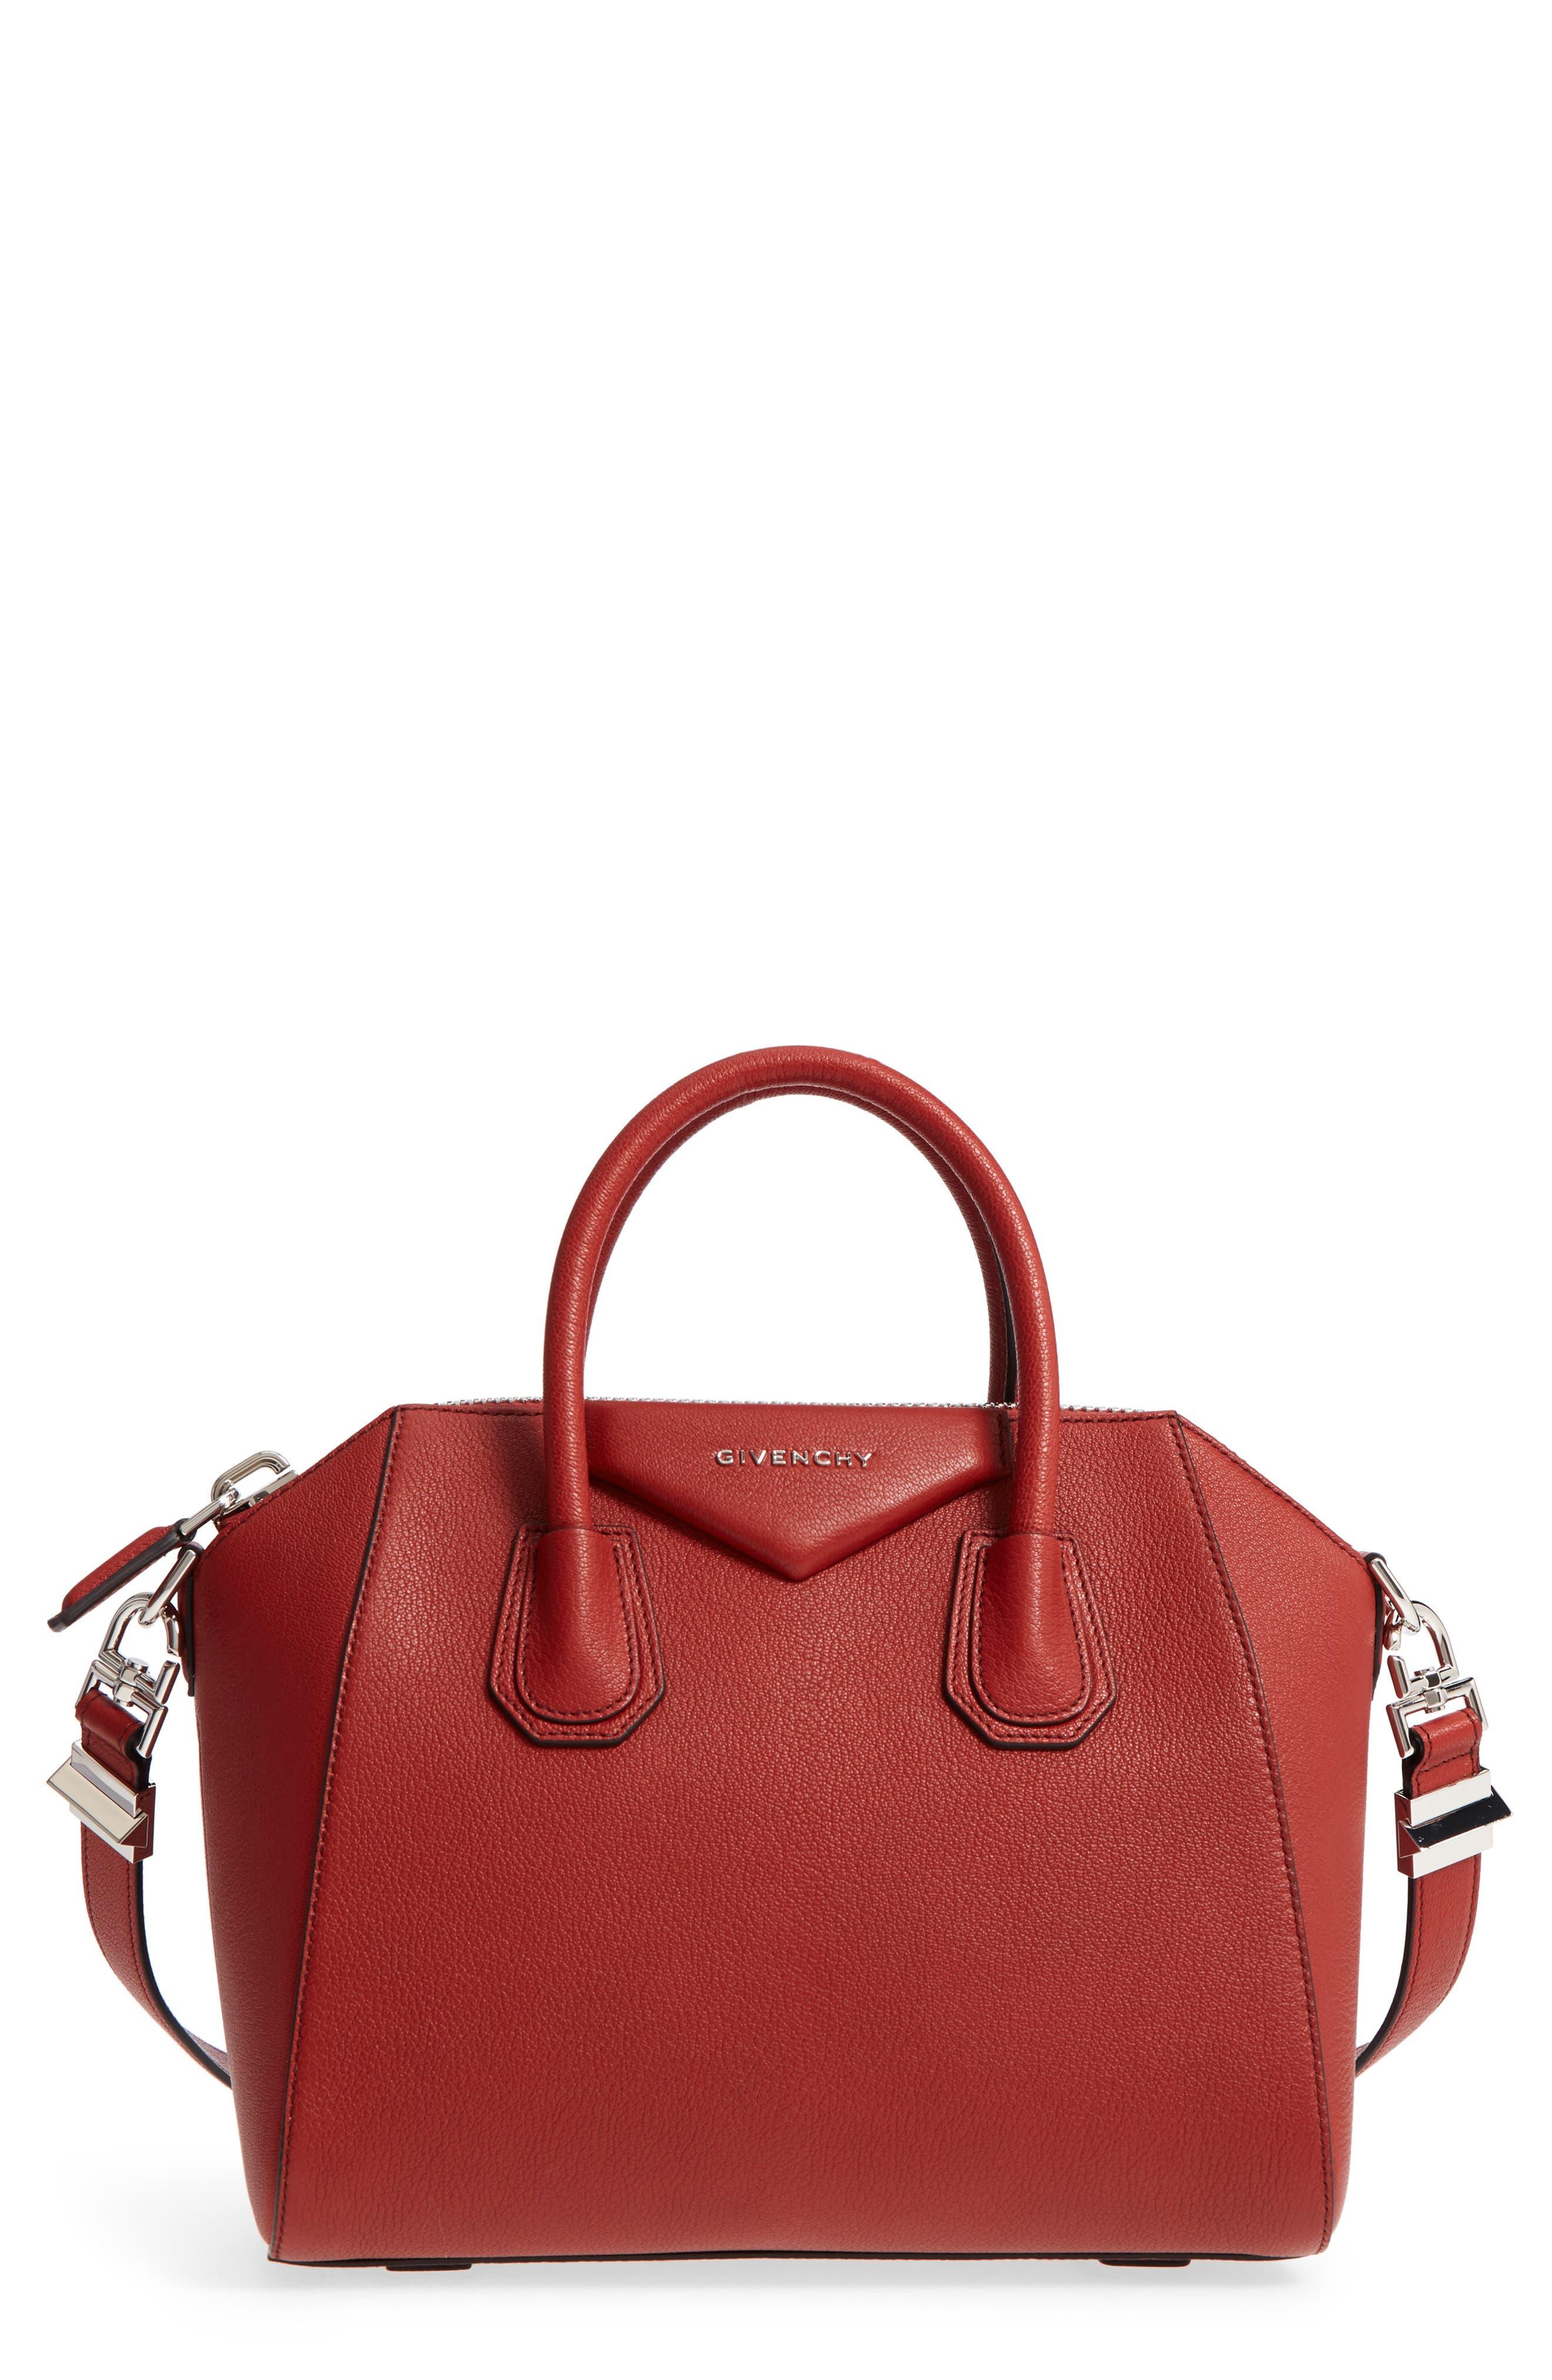 Givenchy 'Small Antigona' Leather Satchel